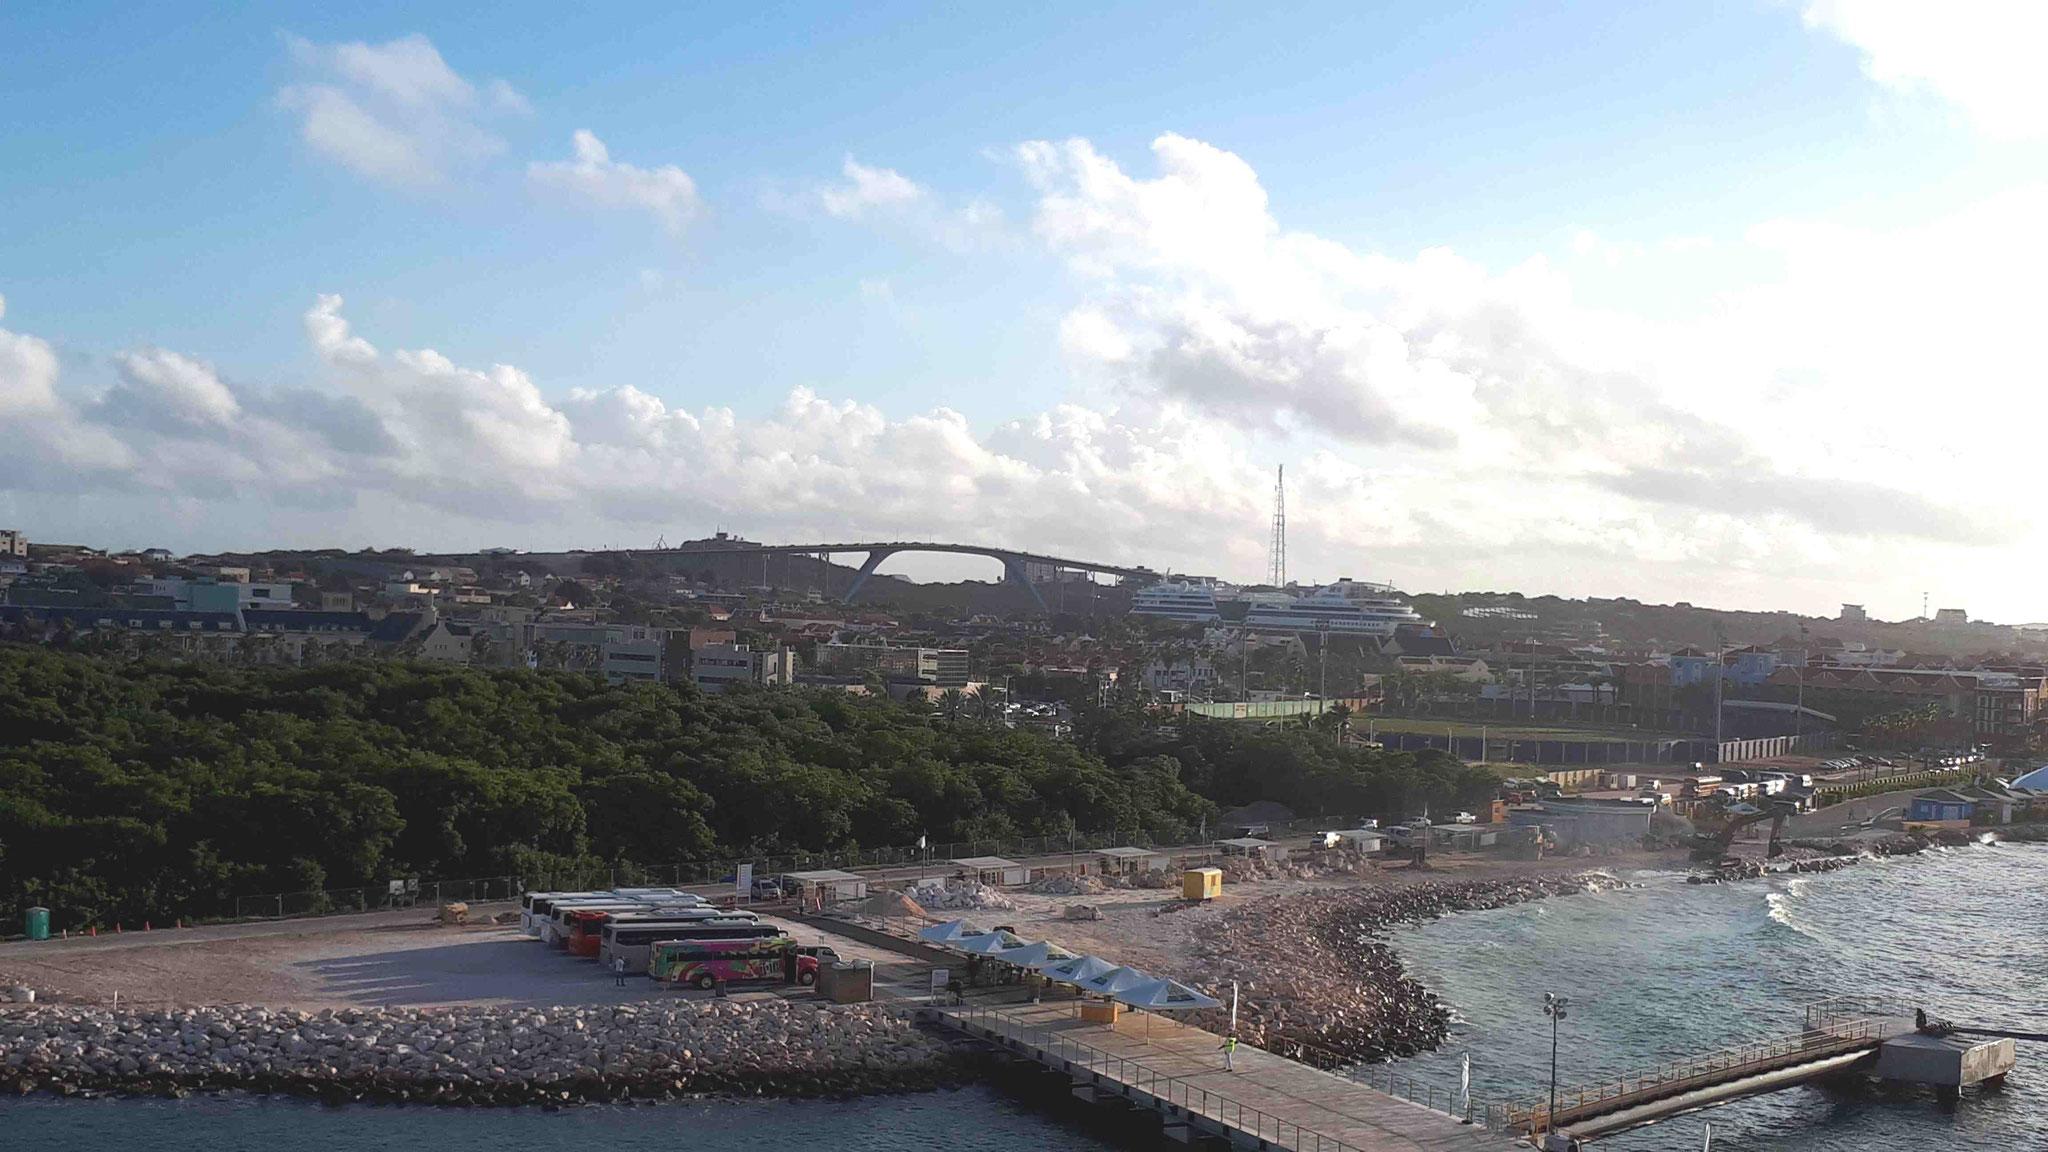 zweiter Mega Cruise Terminal im Bau